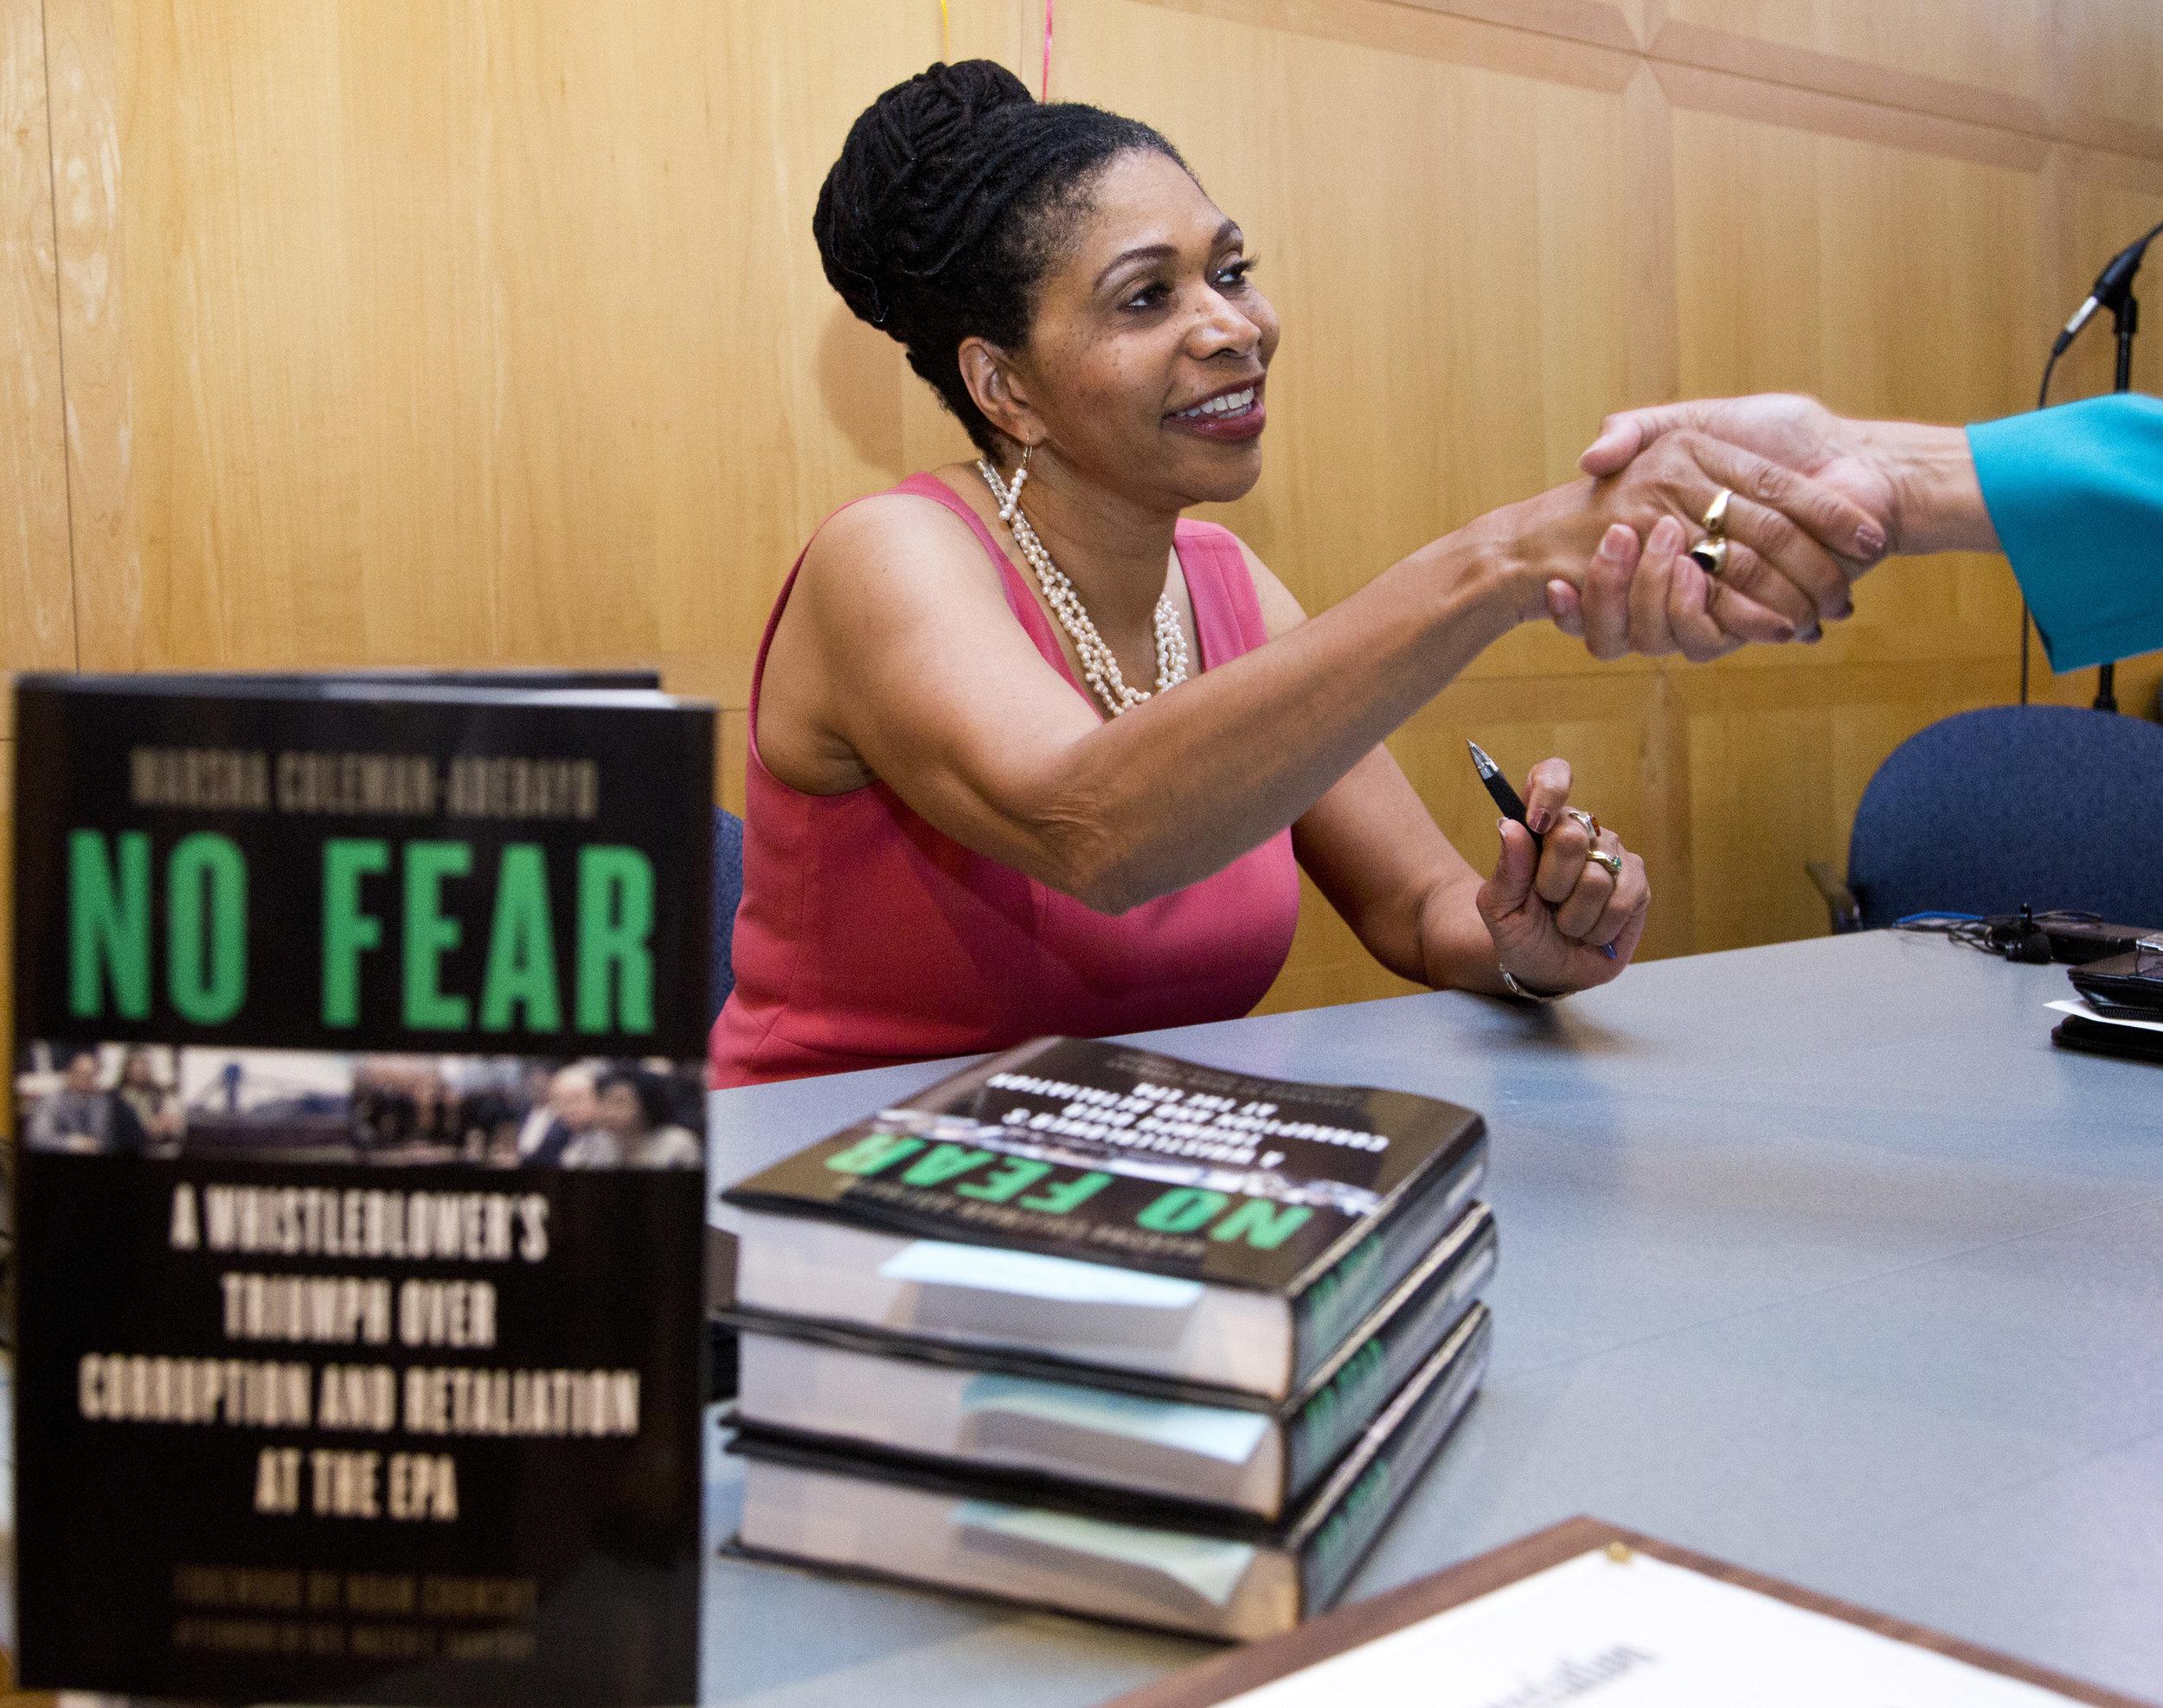 2012 07   No Fear  A Whistleblowers Triump Over Corruption and Retaliation at the EPA                                                044.jpg